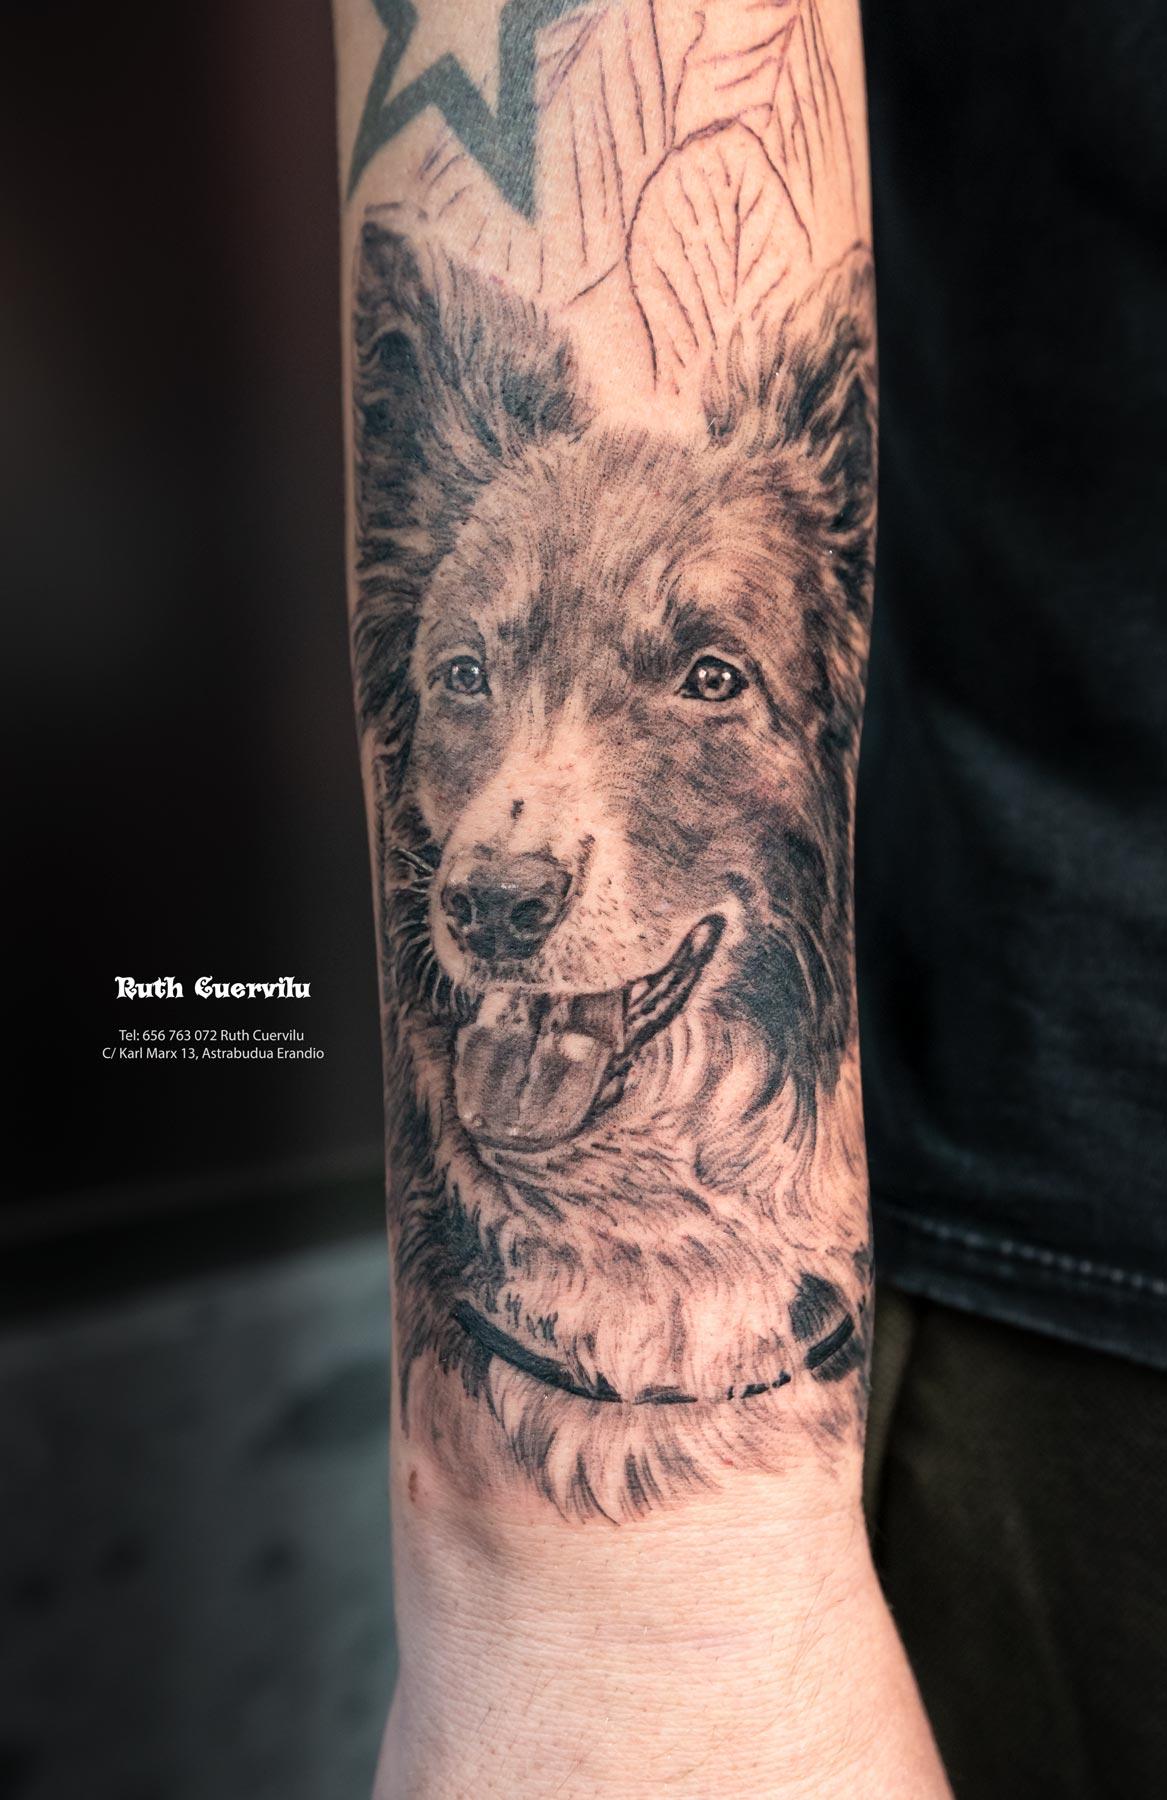 Tatuaje Retrato Perro Sesion 1 - Ruth Cuervilu Tattoo - KM13 Studio - Estudio de tatuajes en Astrabudua Erandio Getxo, Bilbao Bizkaia Basauri barakaldo portugalete